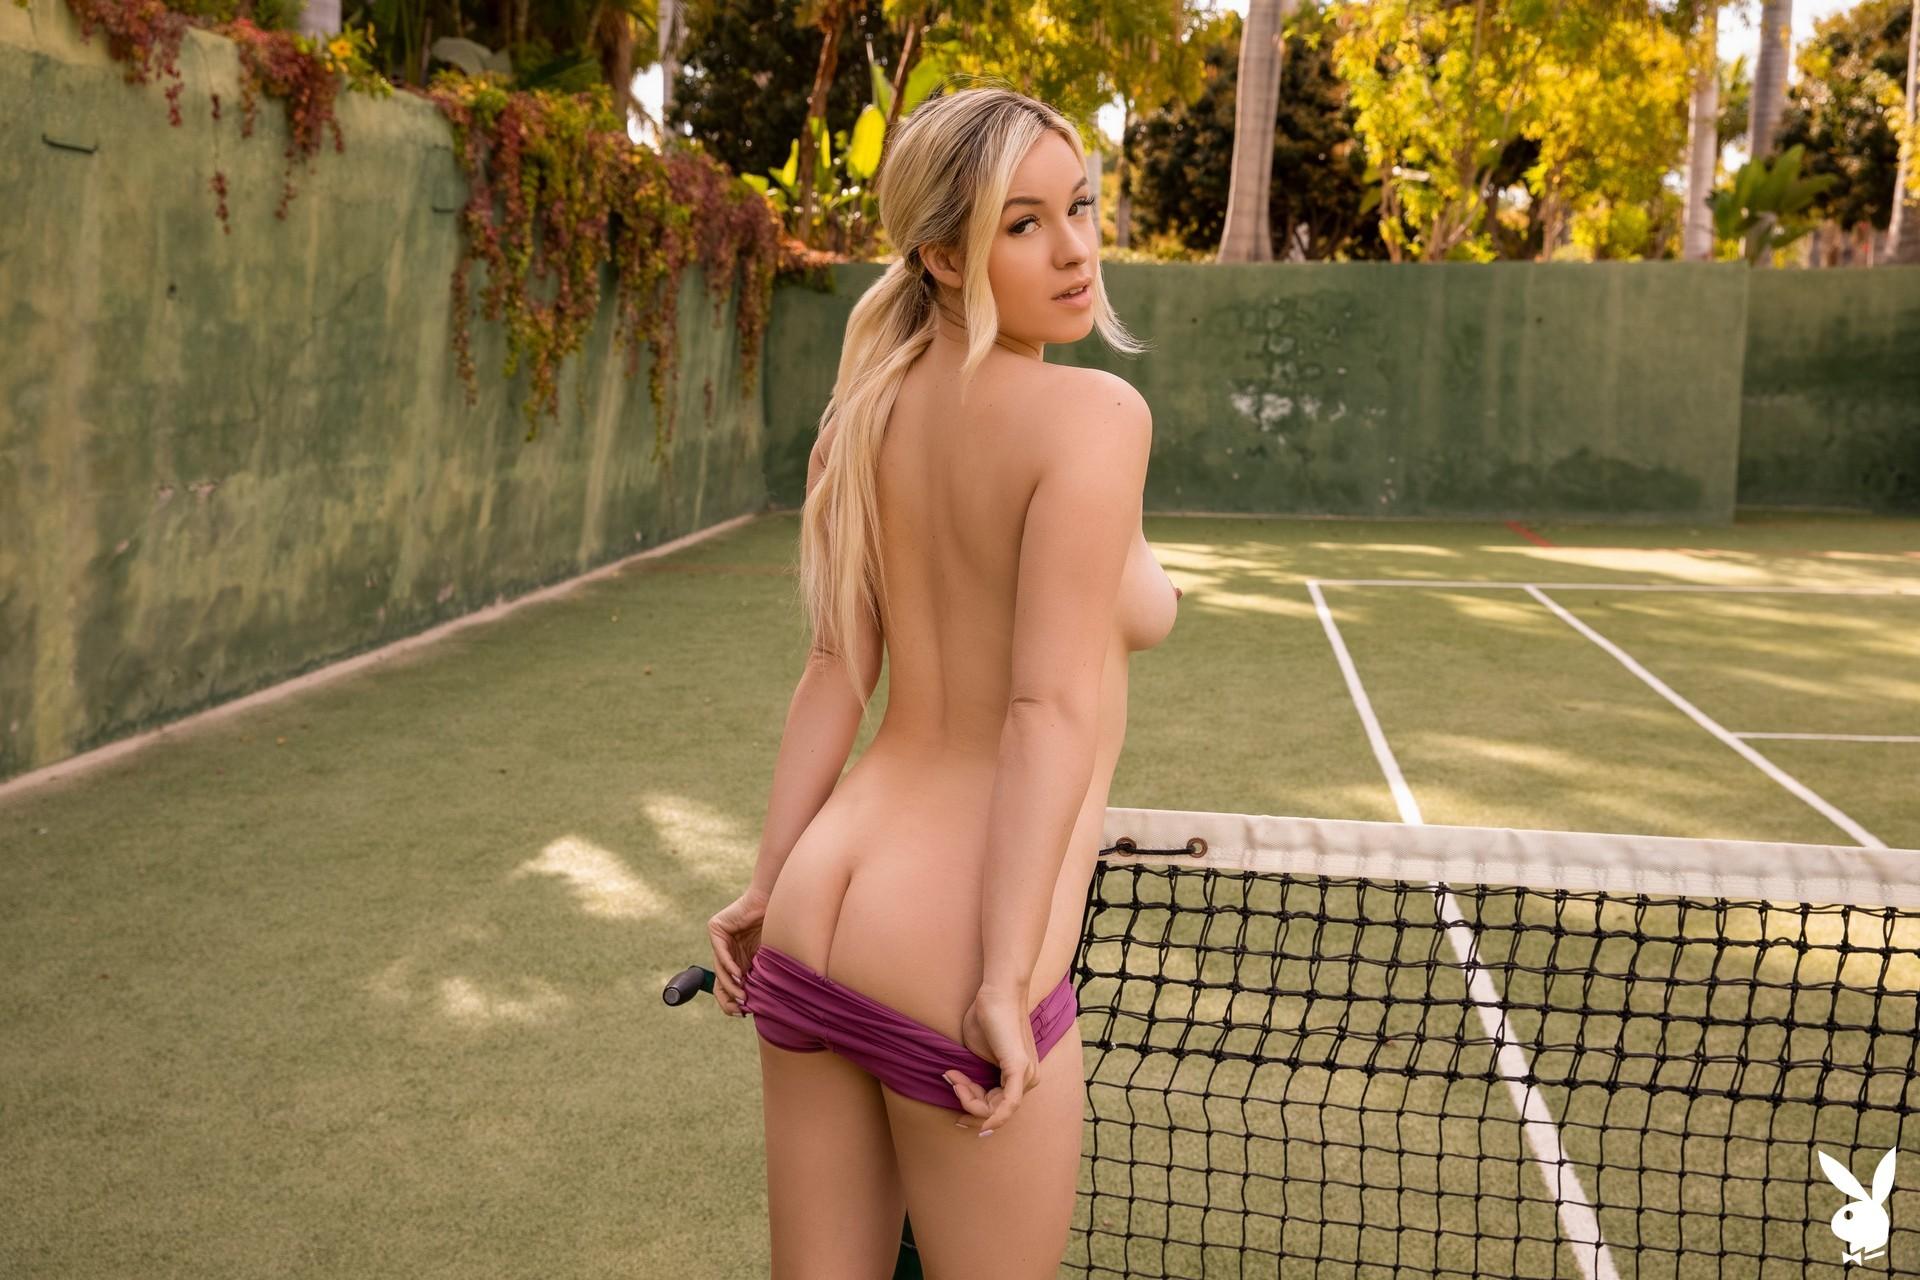 Meg Cyria In She's Got Game Playboy Plus (14)